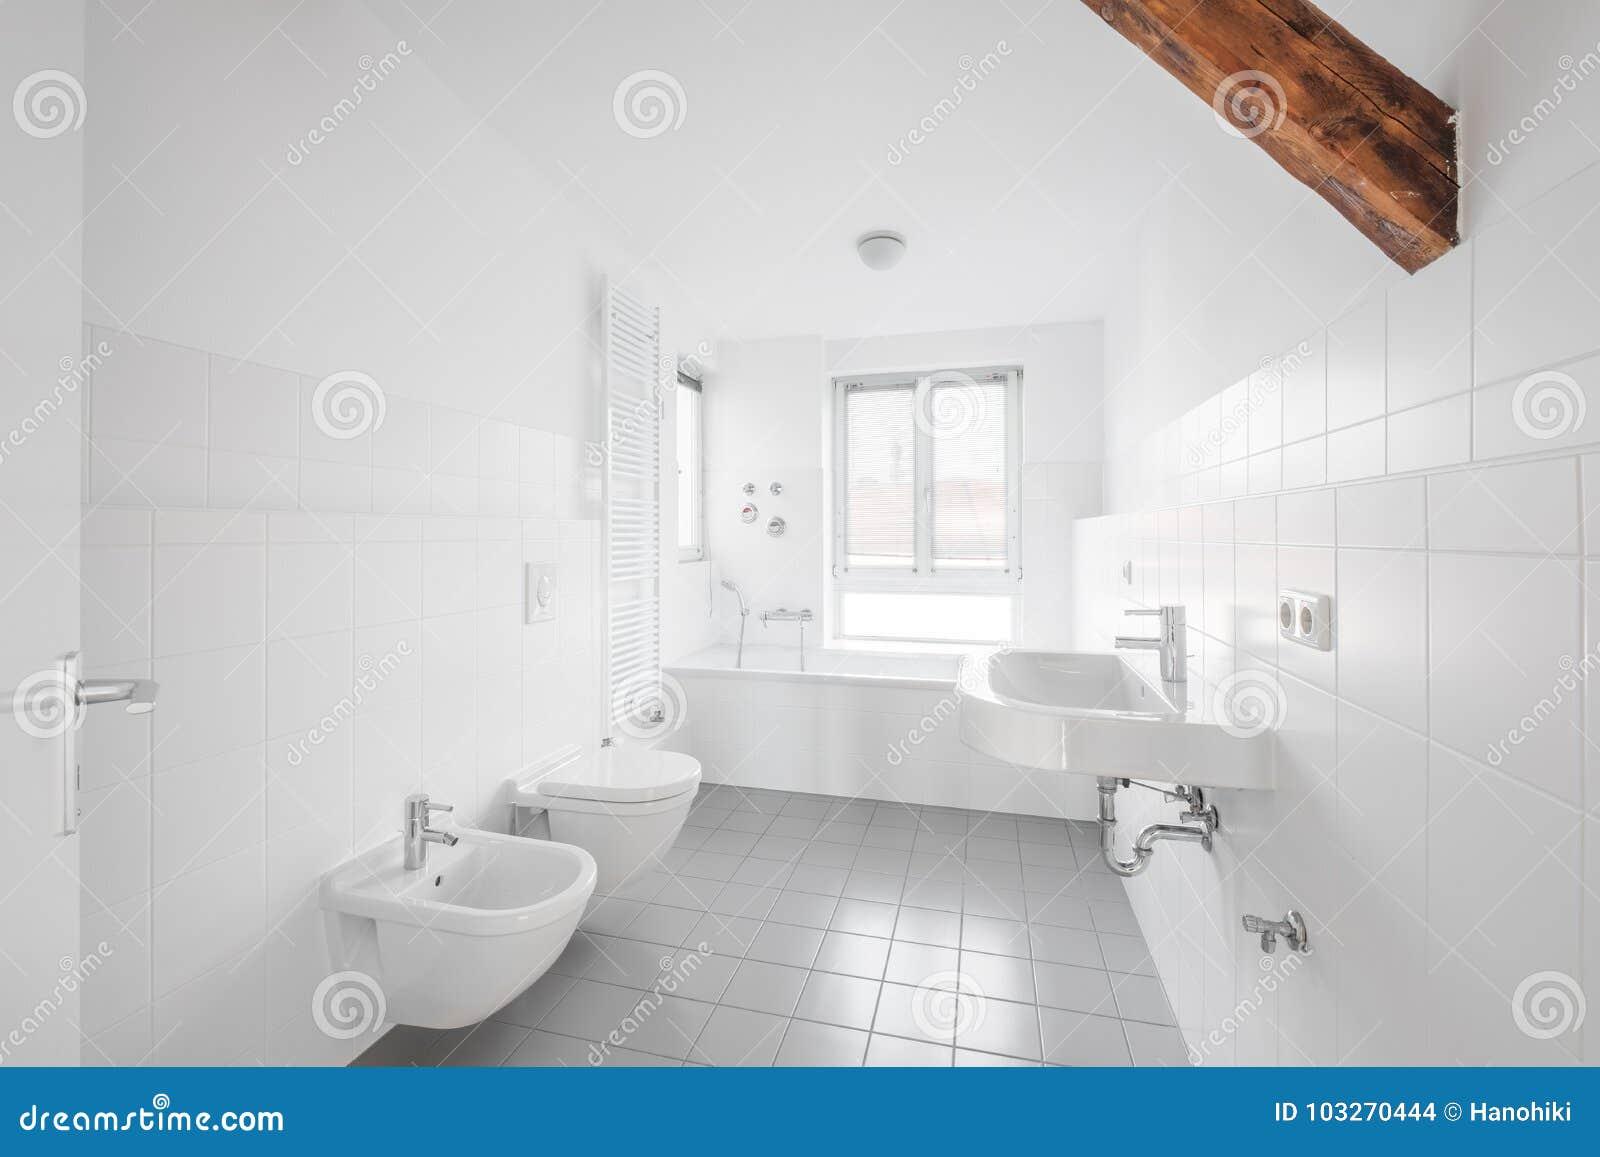 White Bathroom - Modern Tiled Bath Bathtub - Stock Photo - Image of ...